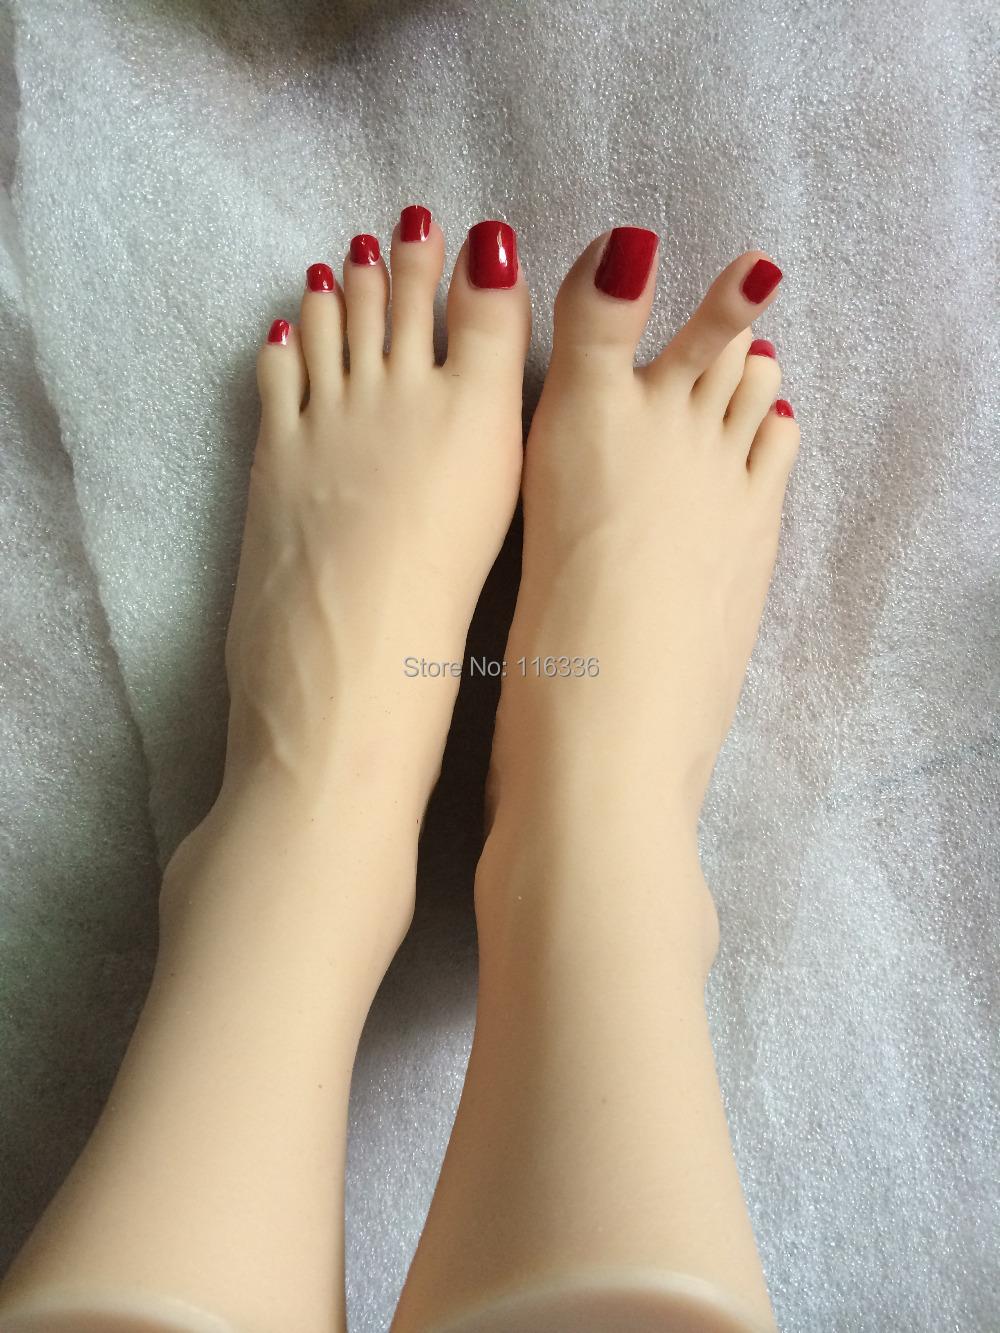 Real silicone sex dolls toe joints foot fetish real Silicon feet/Silicone foot model metal skeleton nails bone air soft feminino(China (Mainland))